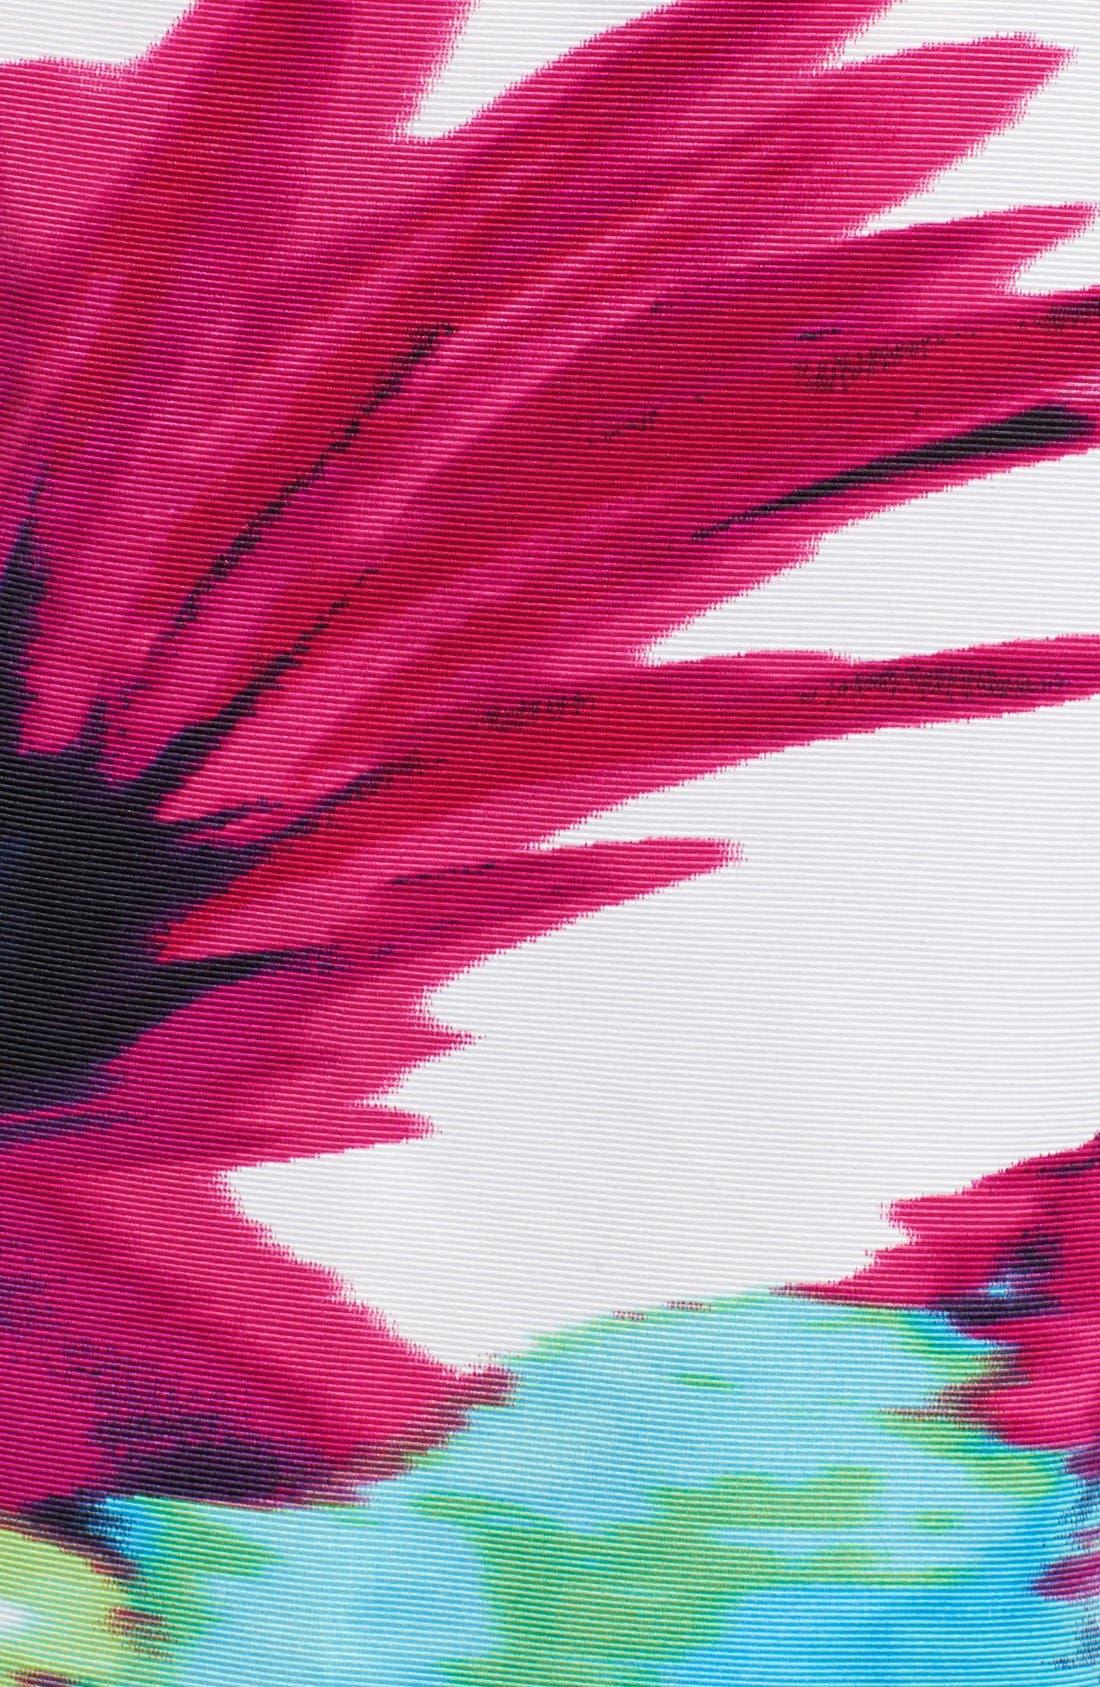 Belted Floral Print Fit & Flare Dress,                             Alternate thumbnail 4, color,                             Print